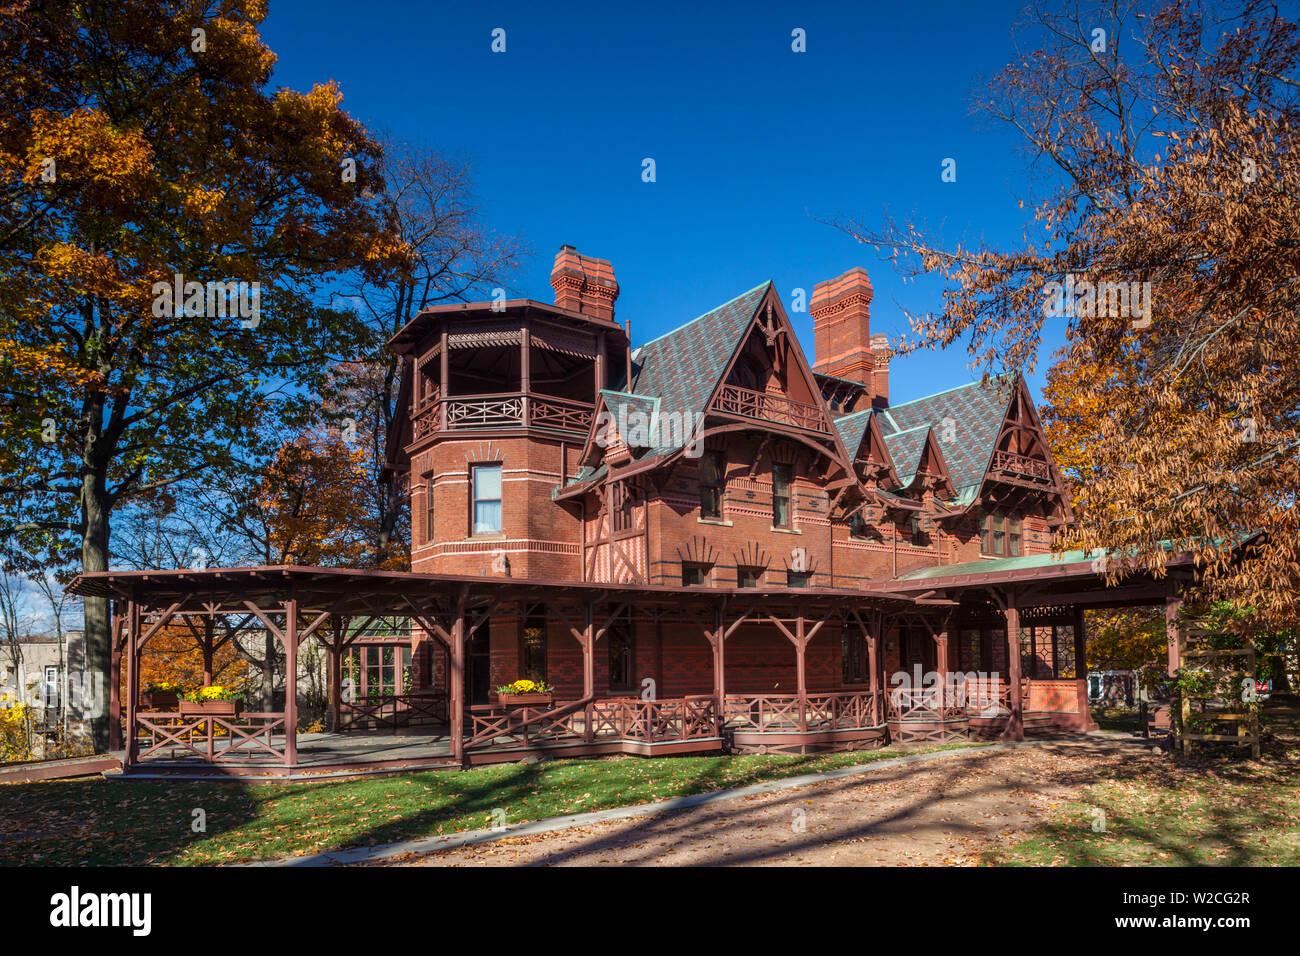 USA, Connecticut, Hartford, Mark Twain House, former home of celebrated American writer Mark Twain, autumn Stock Photo